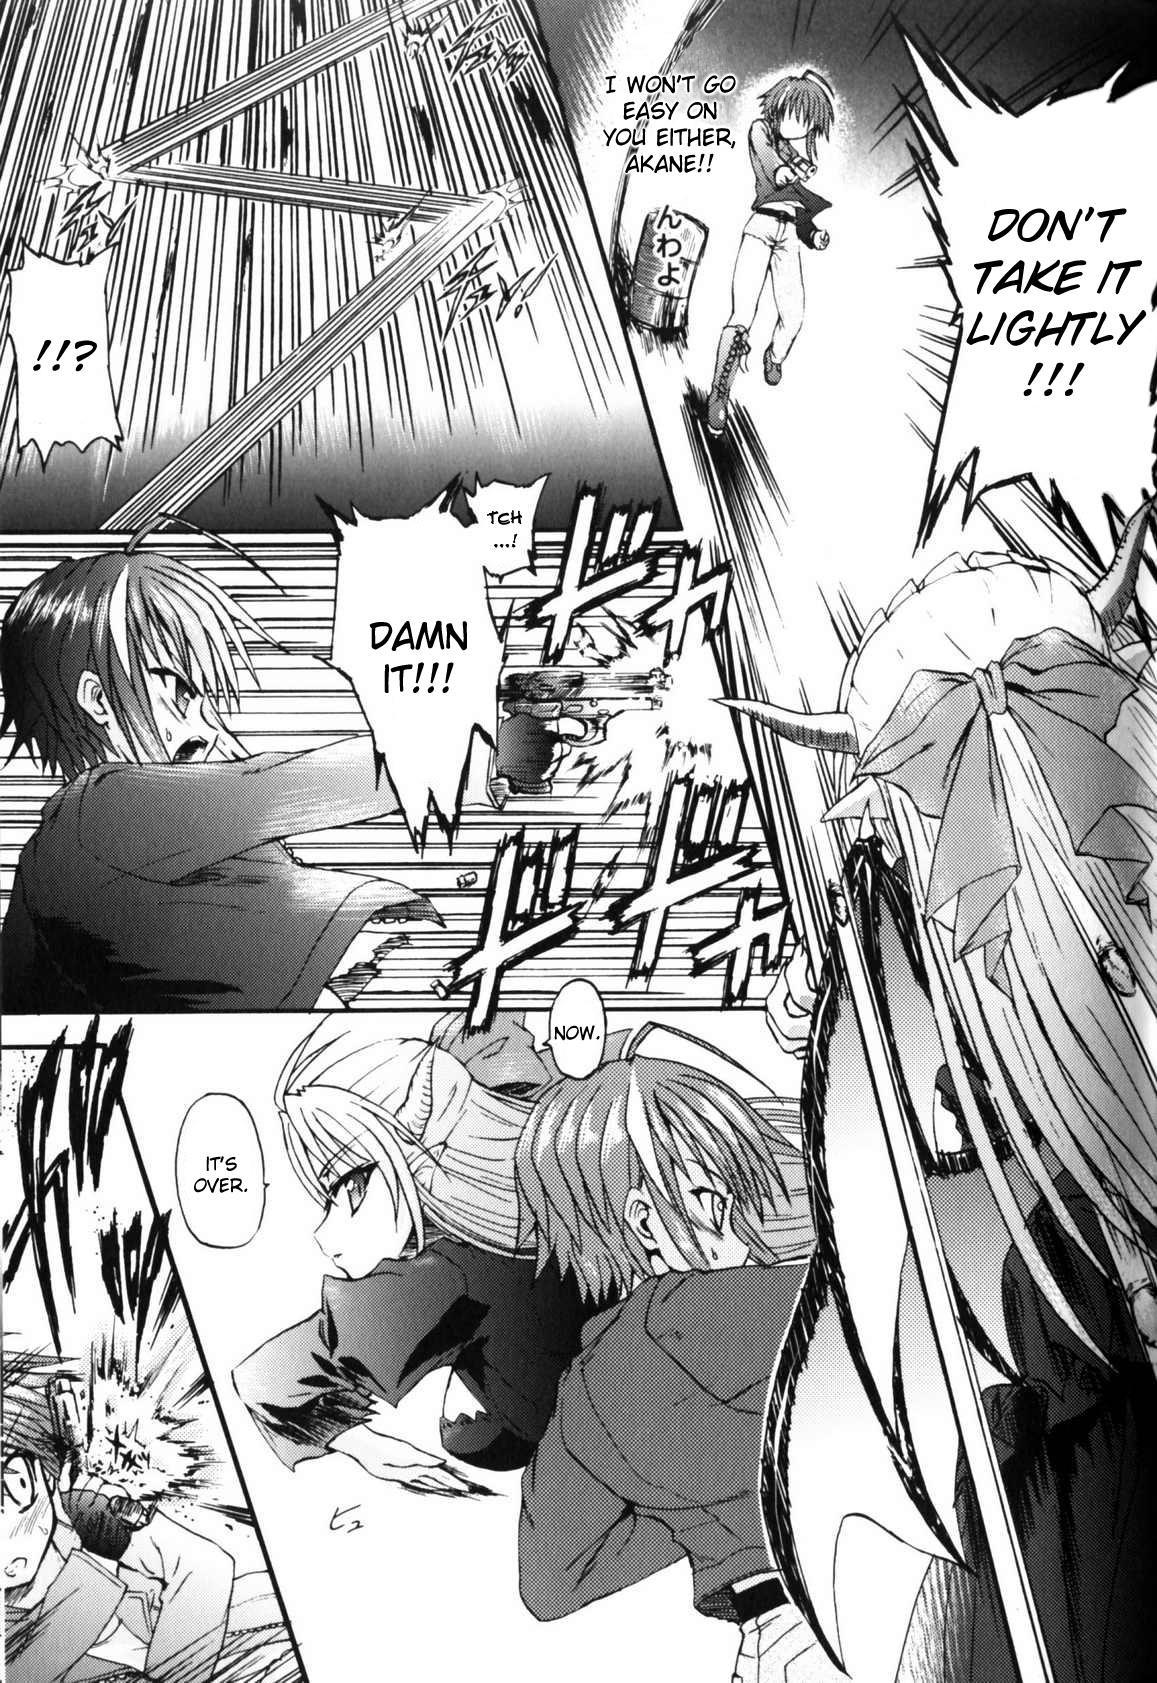 [Rougan] Ma ga Ochiru Yoru (The Night When Evil Falls) - Demonic Imitator Ch. 01-05 [ENG] 60